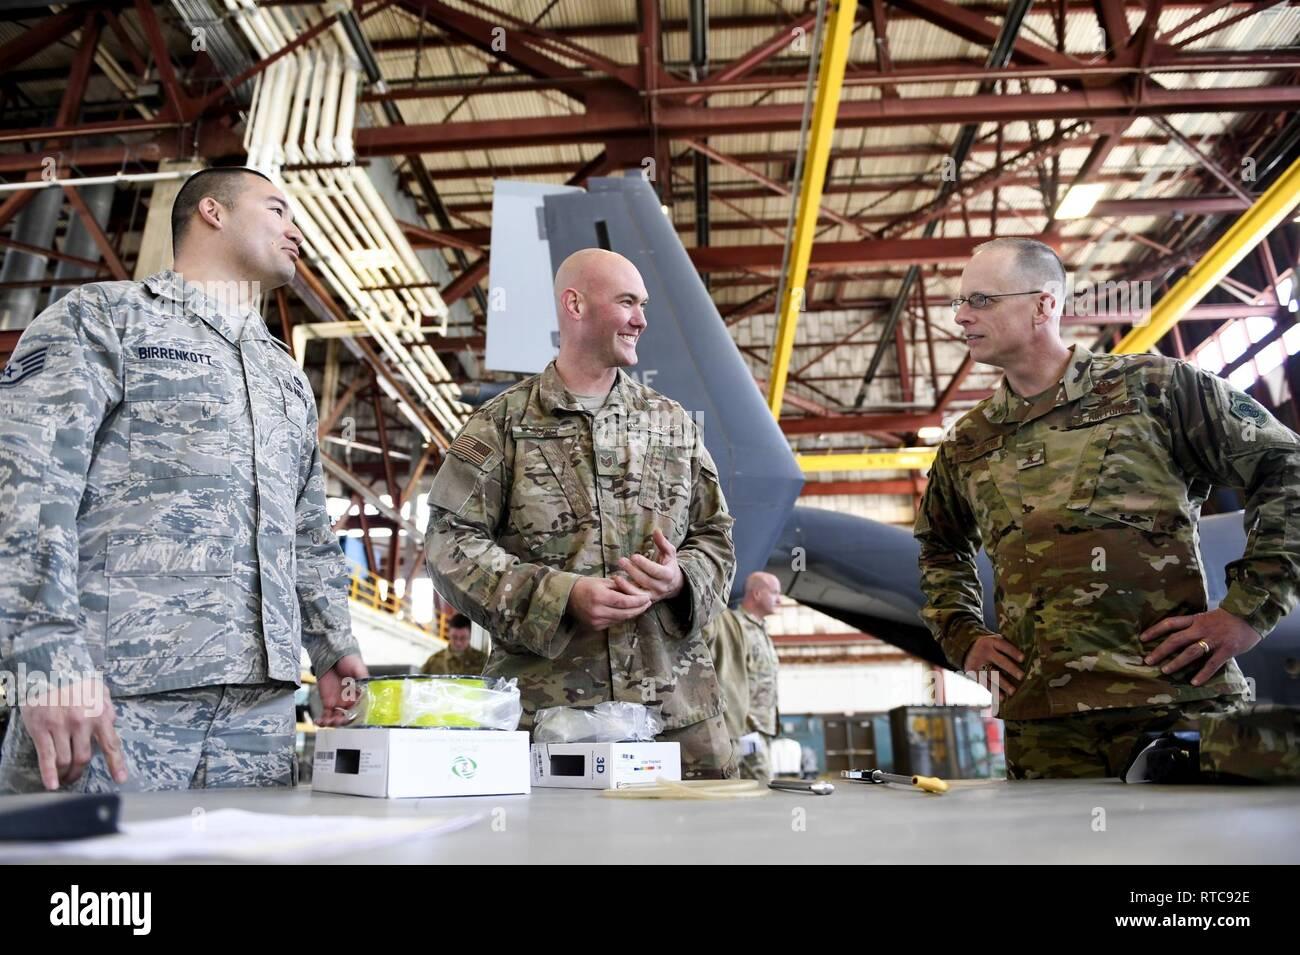 From Left US Air Force Staff Sgt Mark Birrenkott 58th Aircrew Maintenance Squadron